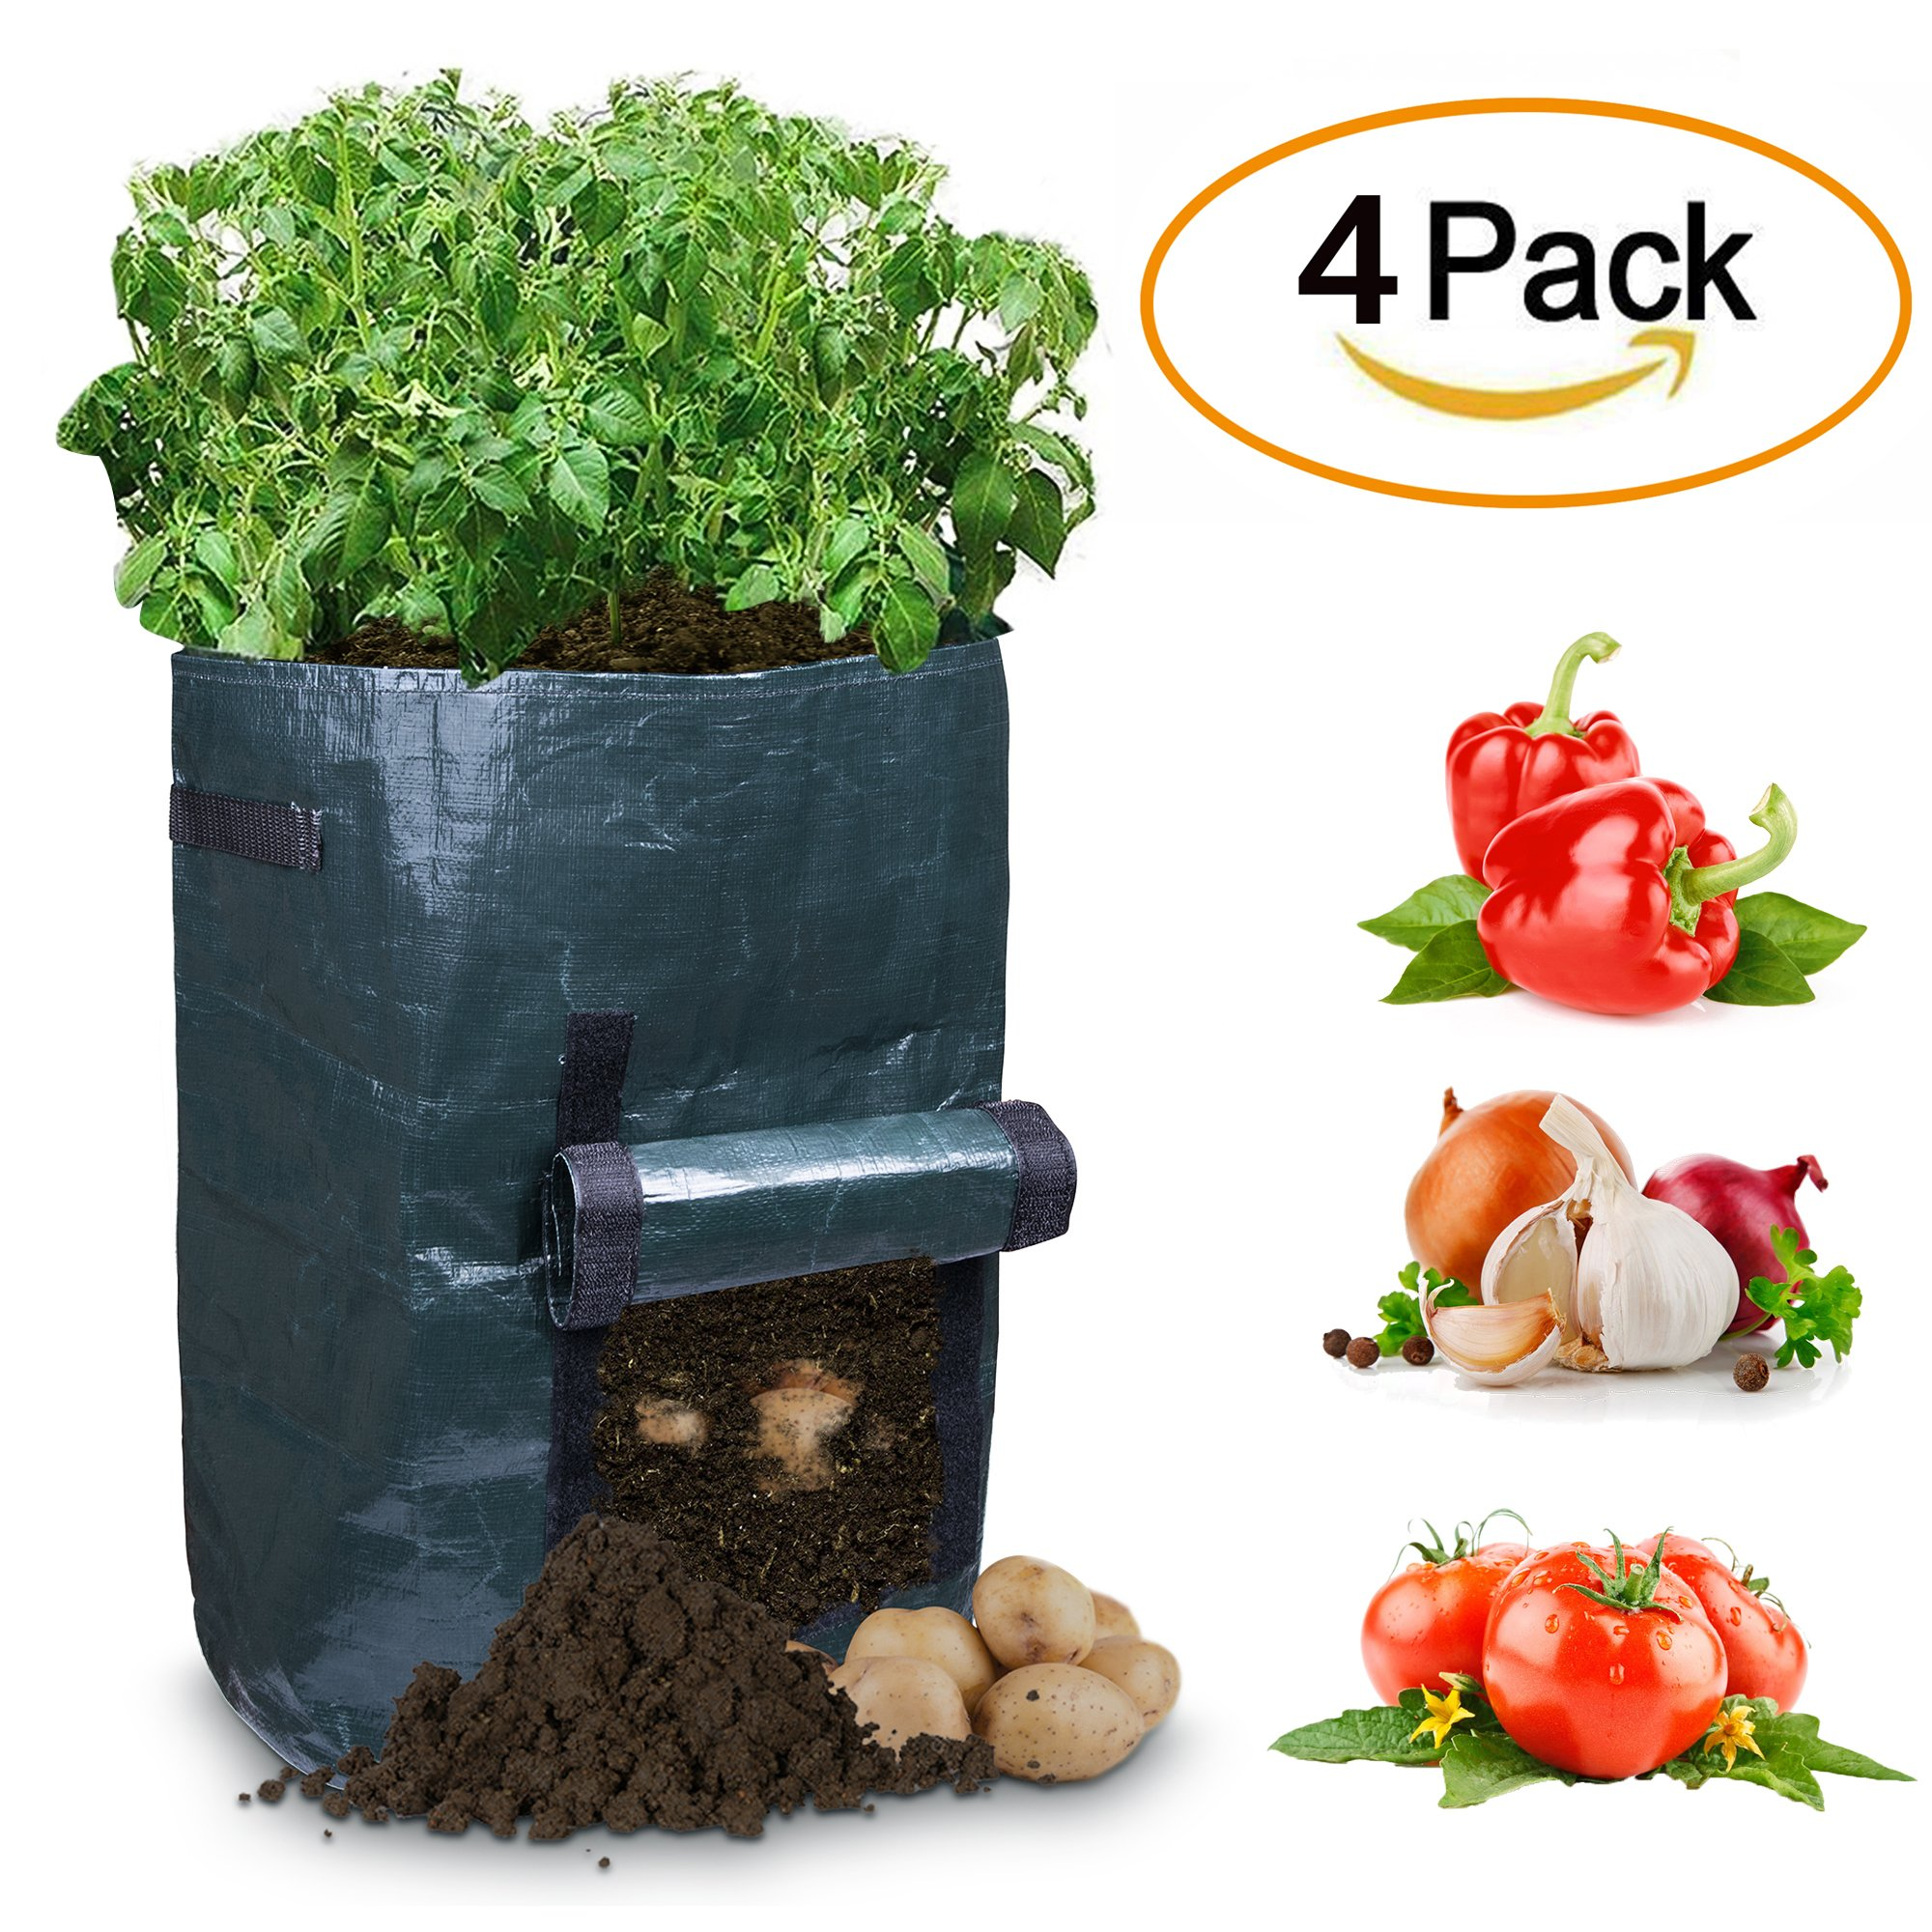 Garden Potato Grow Bags with Flap and Handles Aeration Fabric Pots Heavy Duty 10 Gallon,Portable Durable Home Farm Planter Planting Black Bag for Potato,Carrot,Onion & Vegetables Plant (4 Pack)